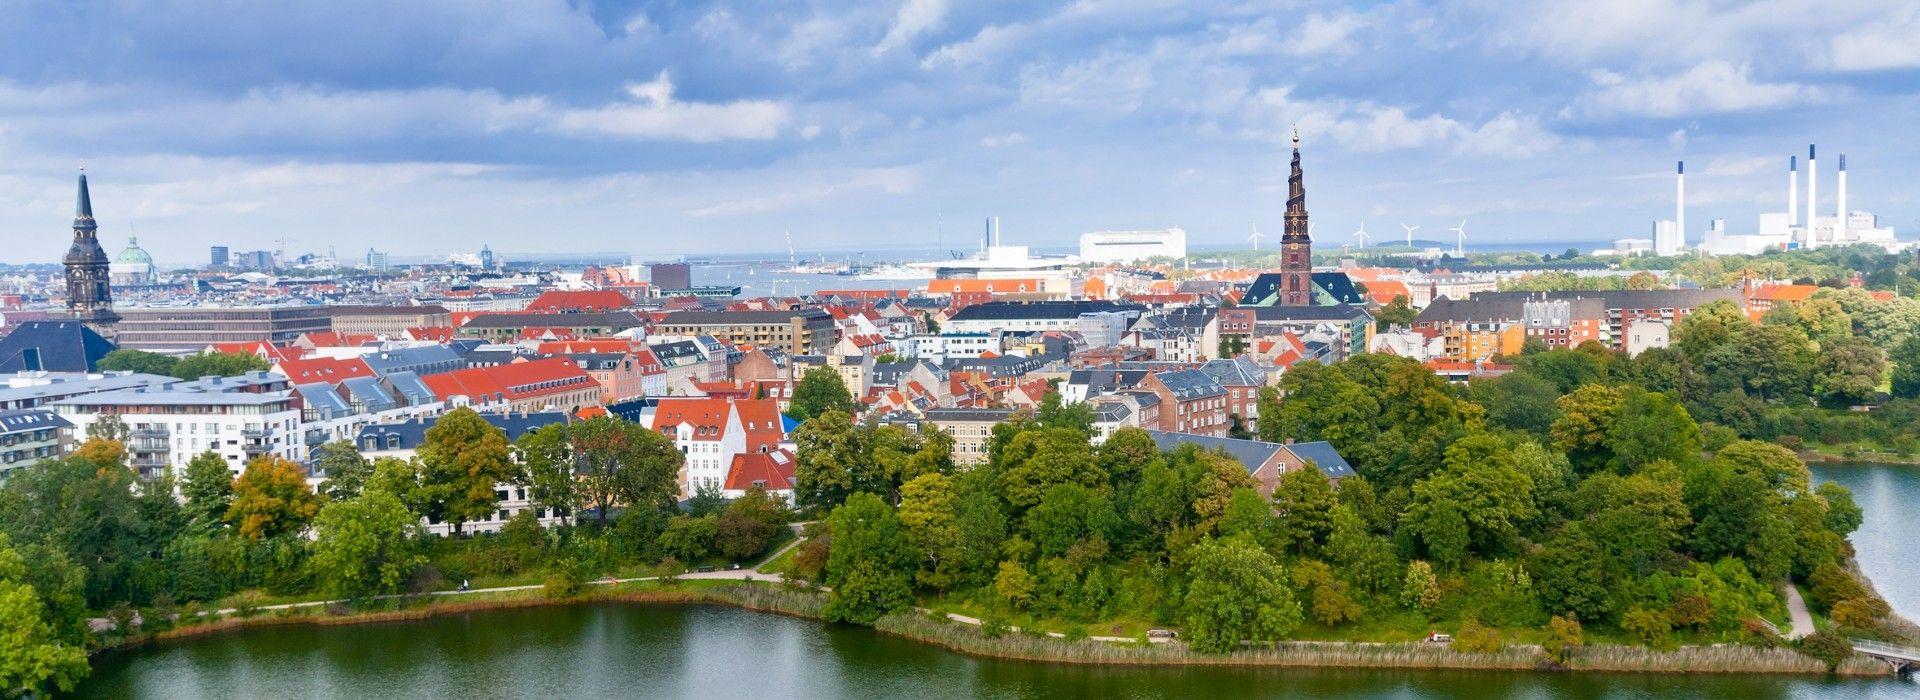 Trekking Tours in Europe